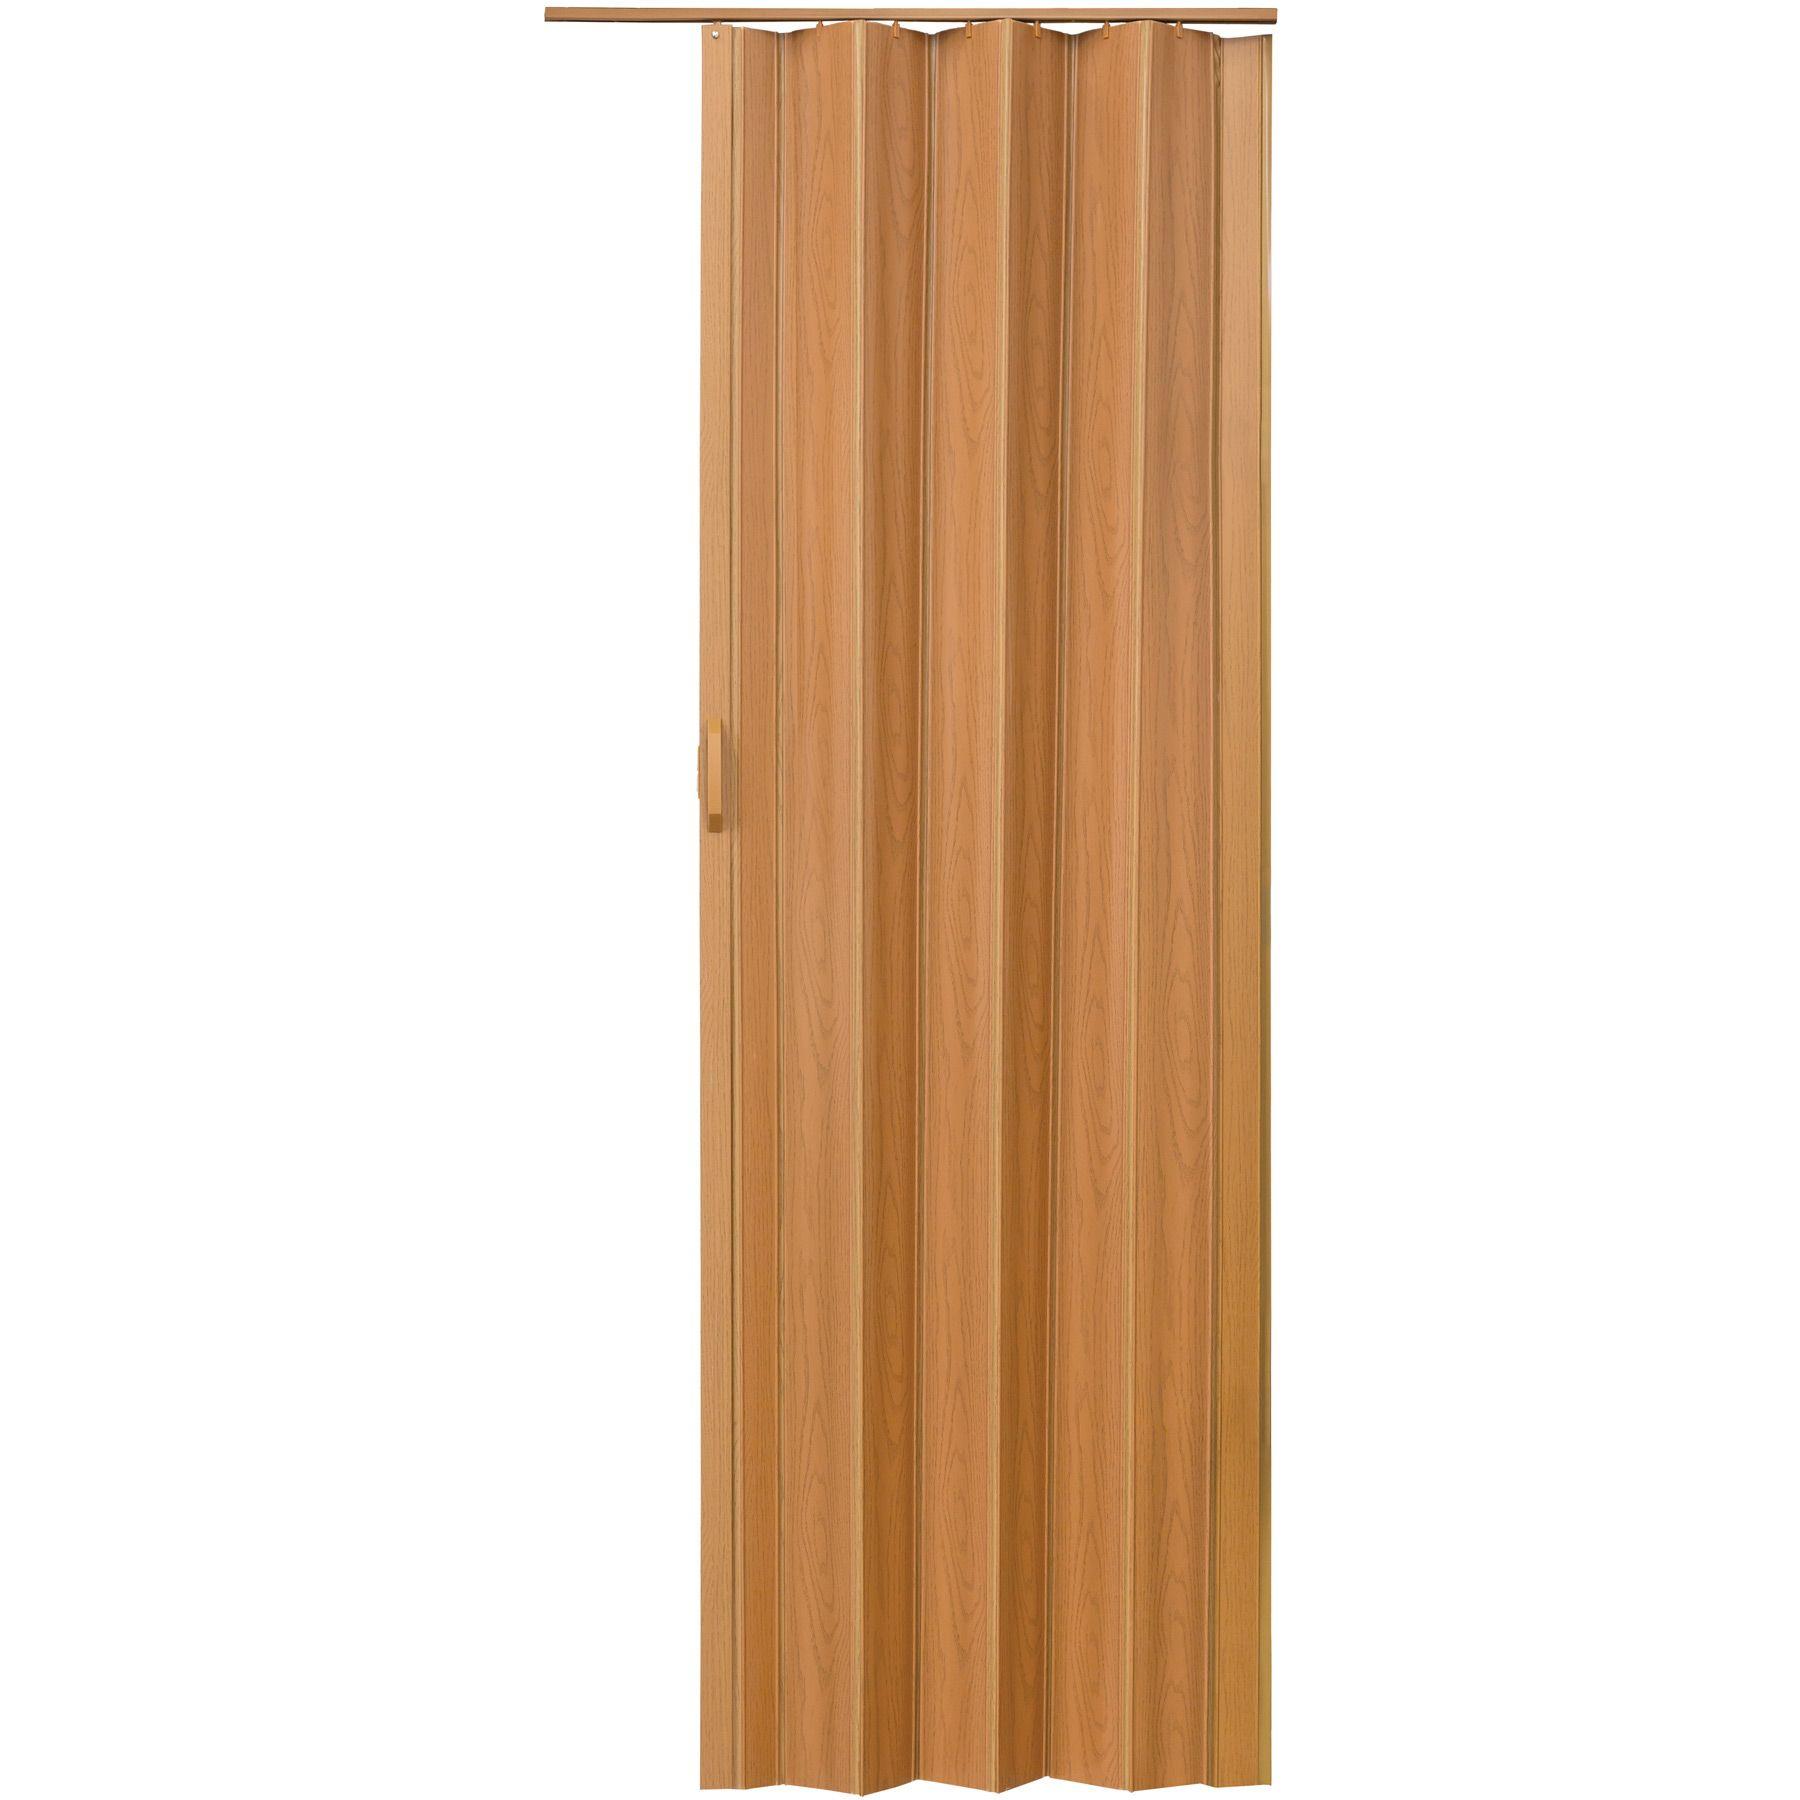 porte accord on placard pliante extensible pvc salle de bain 80 x 203 cm noyer ebay. Black Bedroom Furniture Sets. Home Design Ideas